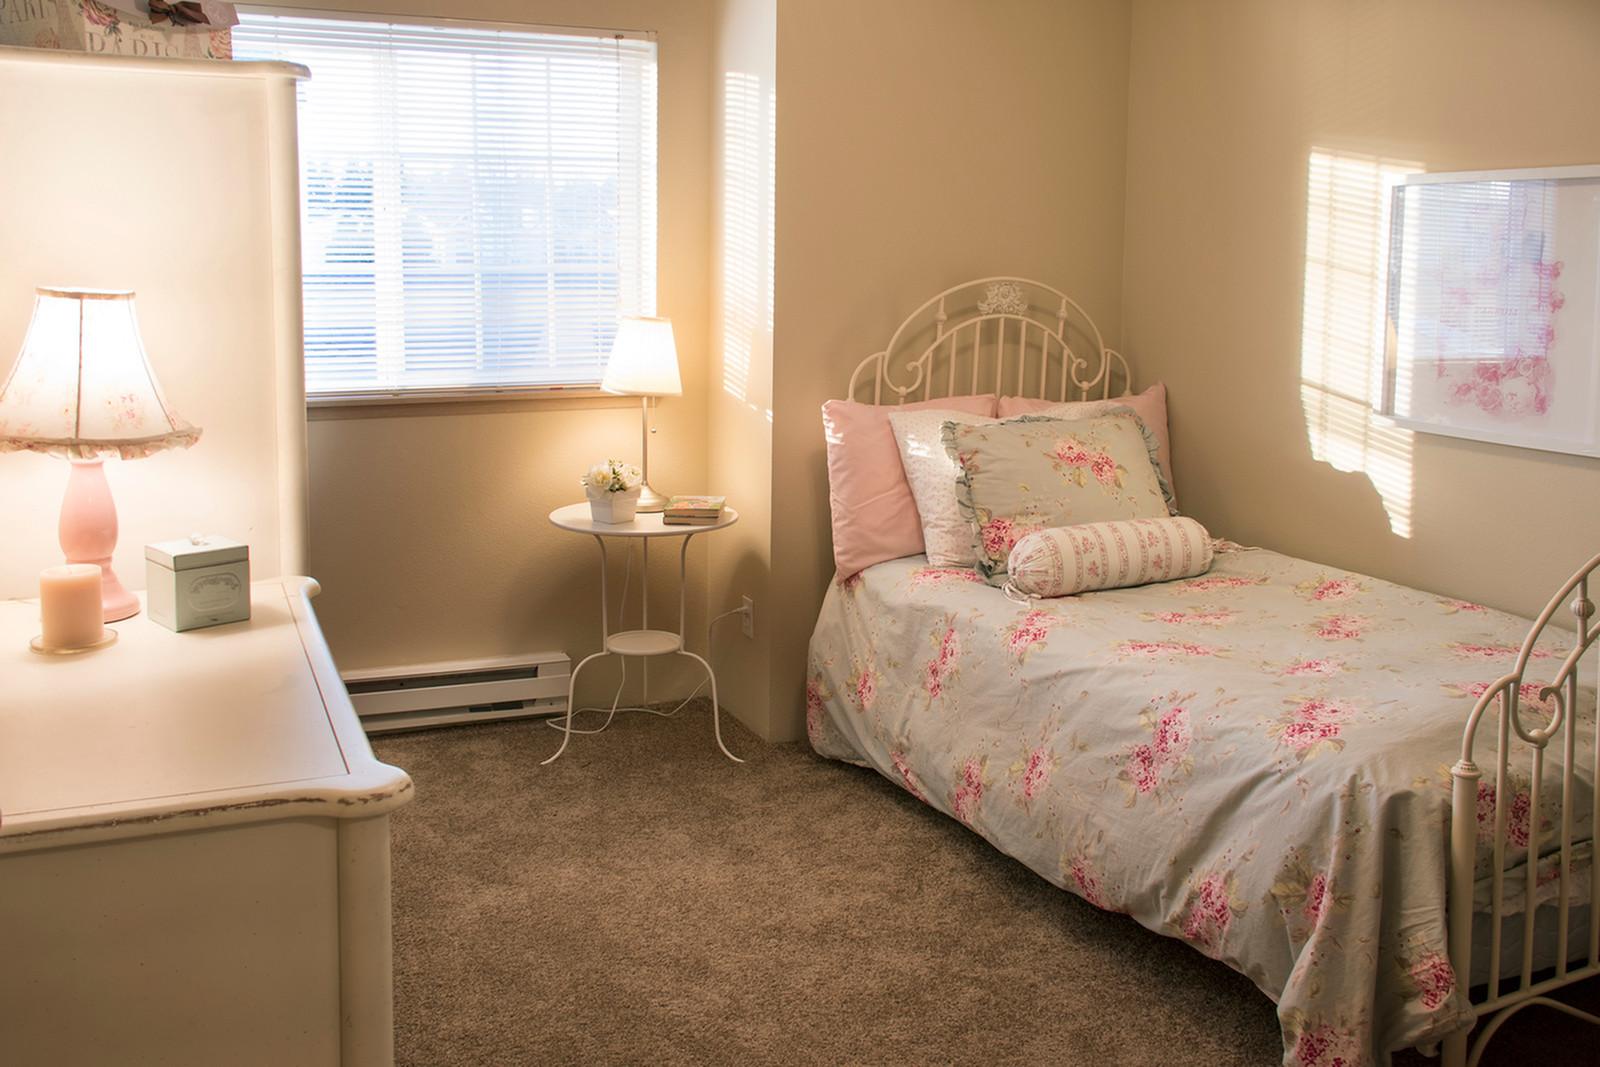 Beautiful Renovated 1 2 3 Bedroom Apartments| Puyallup WA Apartments For Rent | Canyon Park